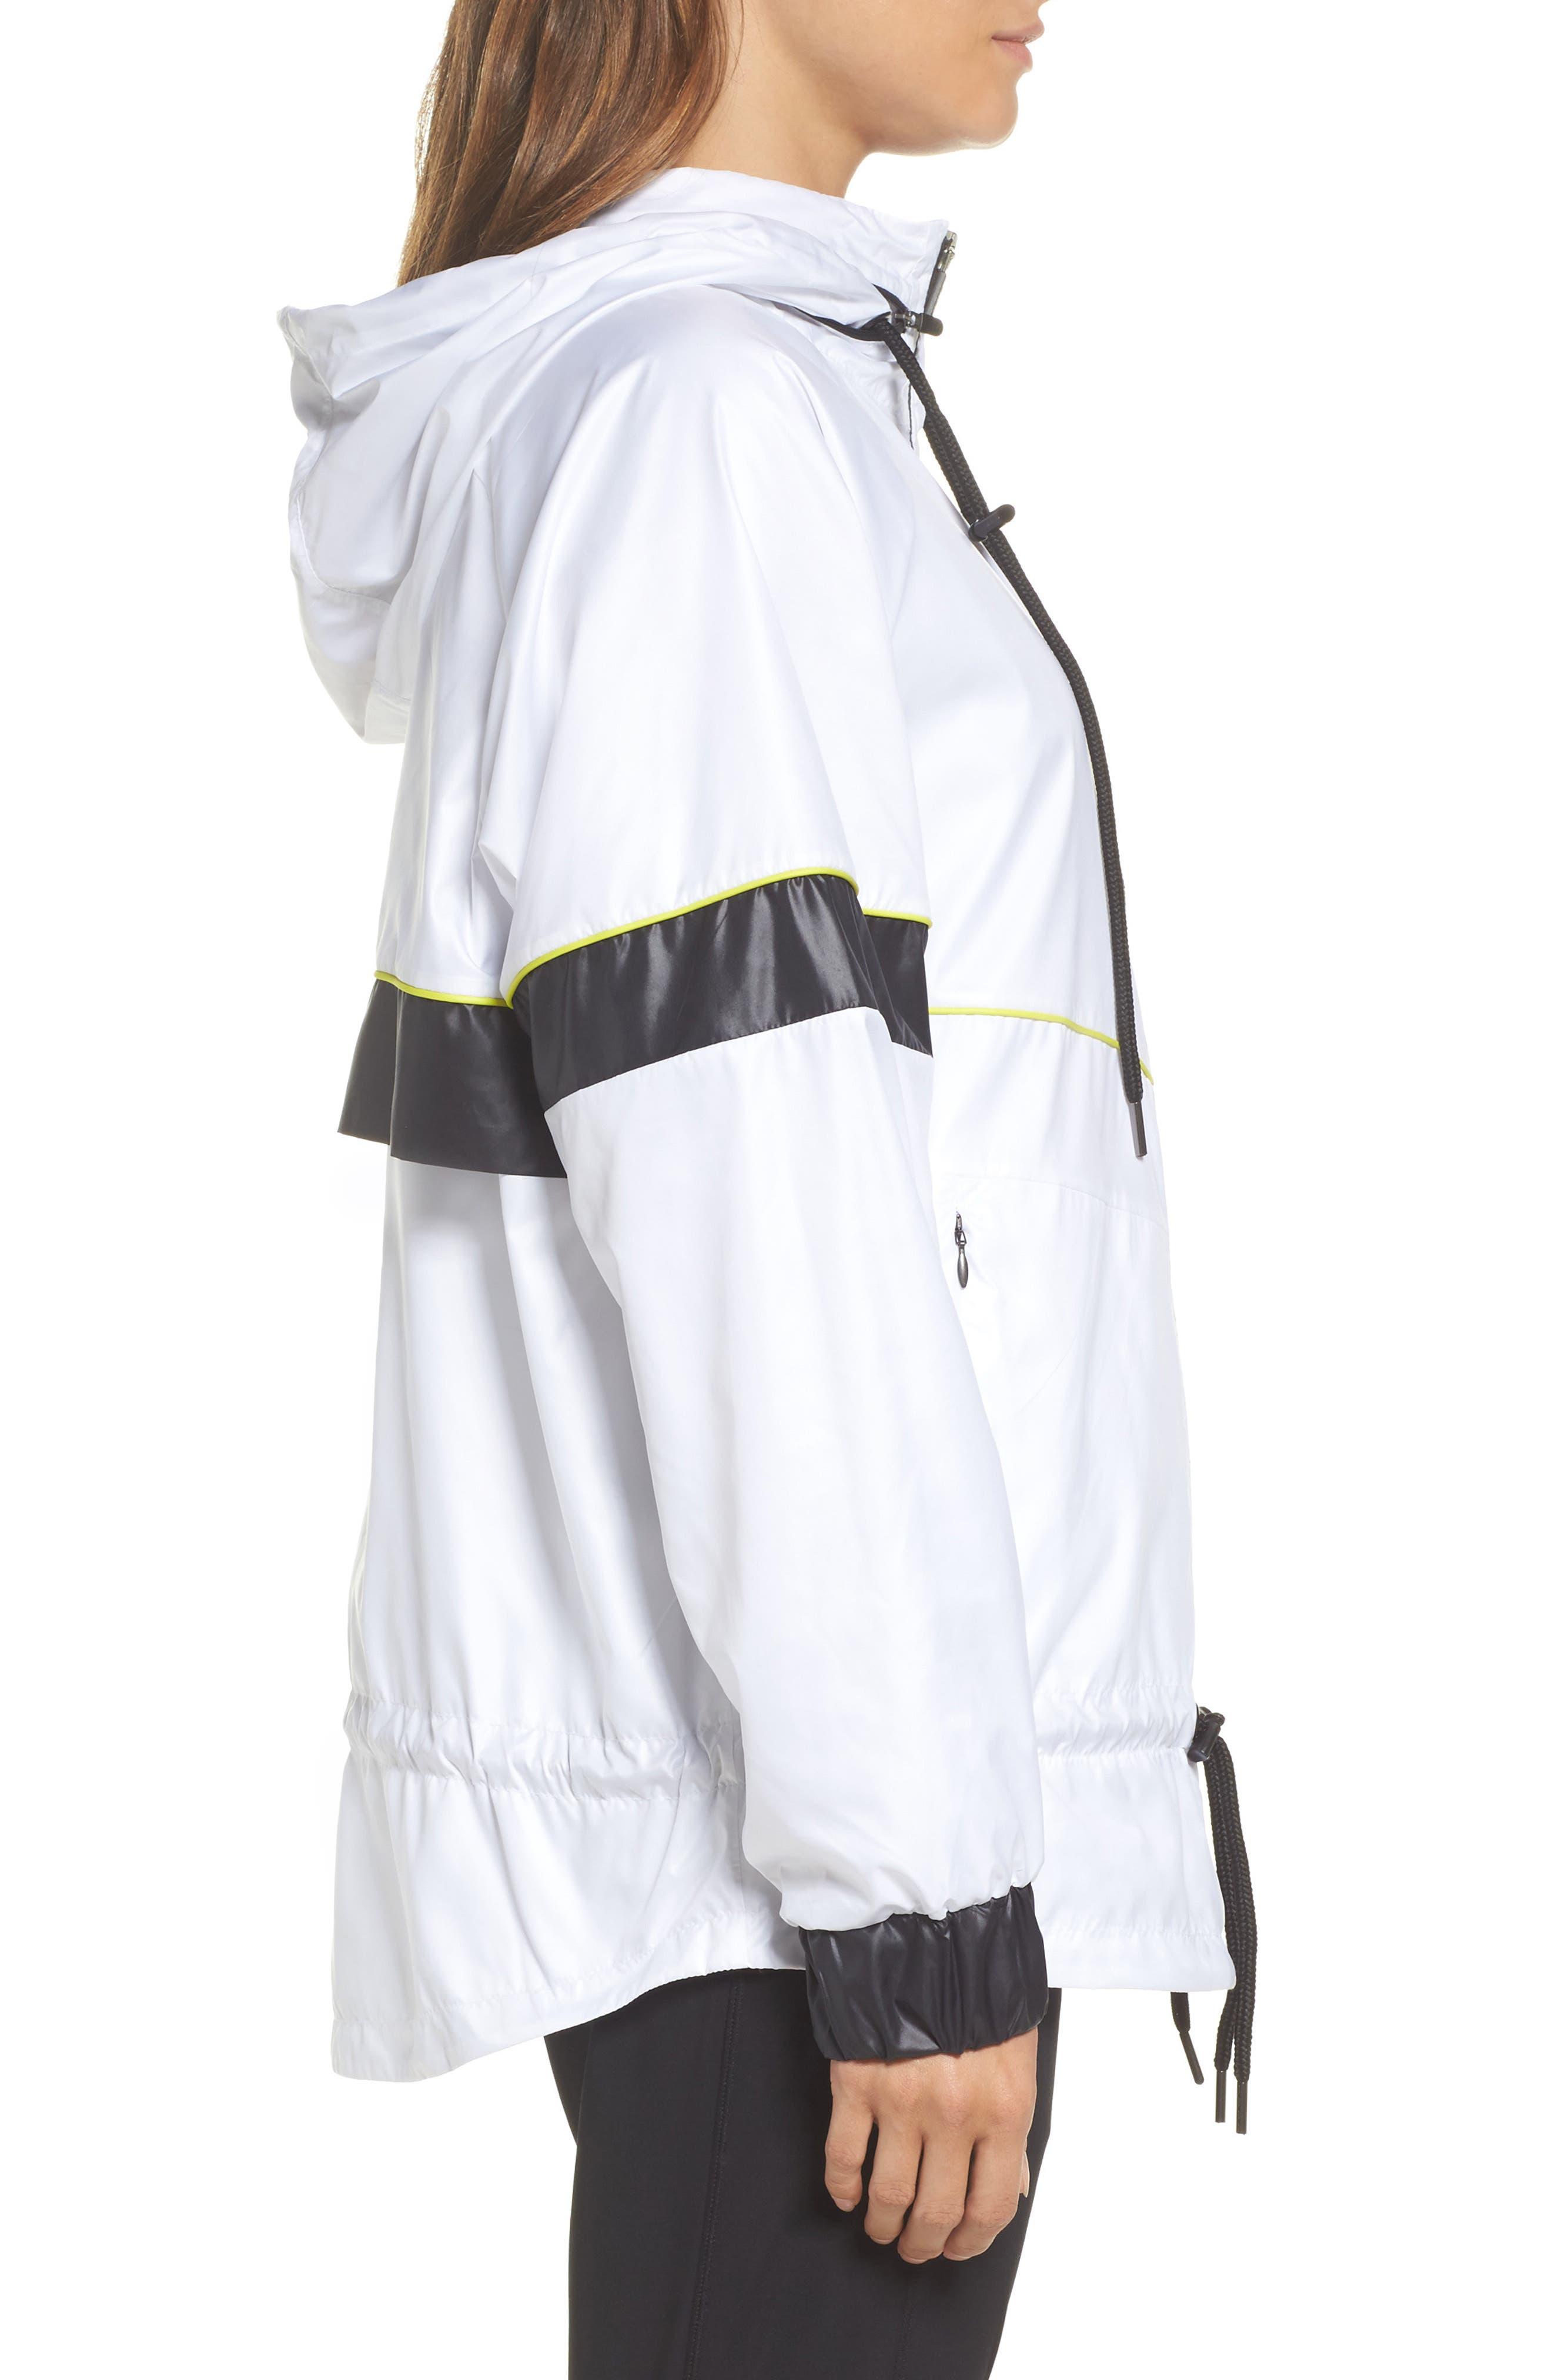 Shadowboxer Jacket,                             Alternate thumbnail 3, color,                             100